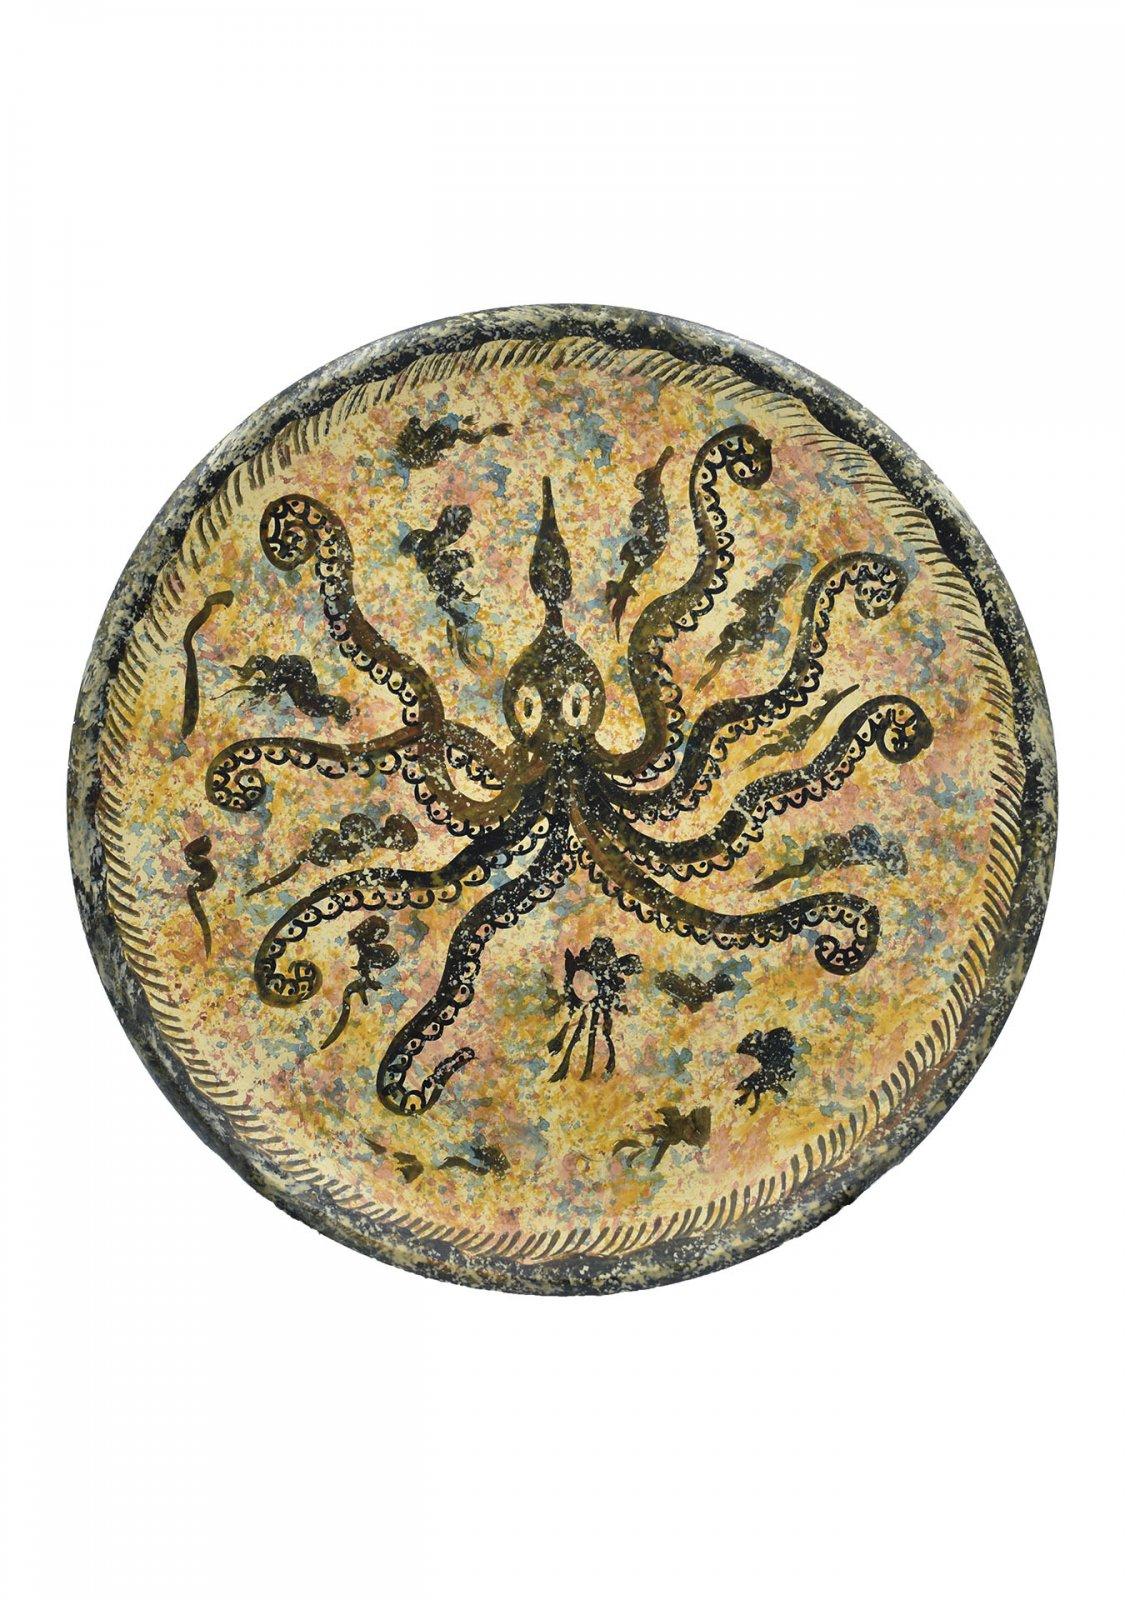 Greek ceramic plate depicting an octopus (14cm)